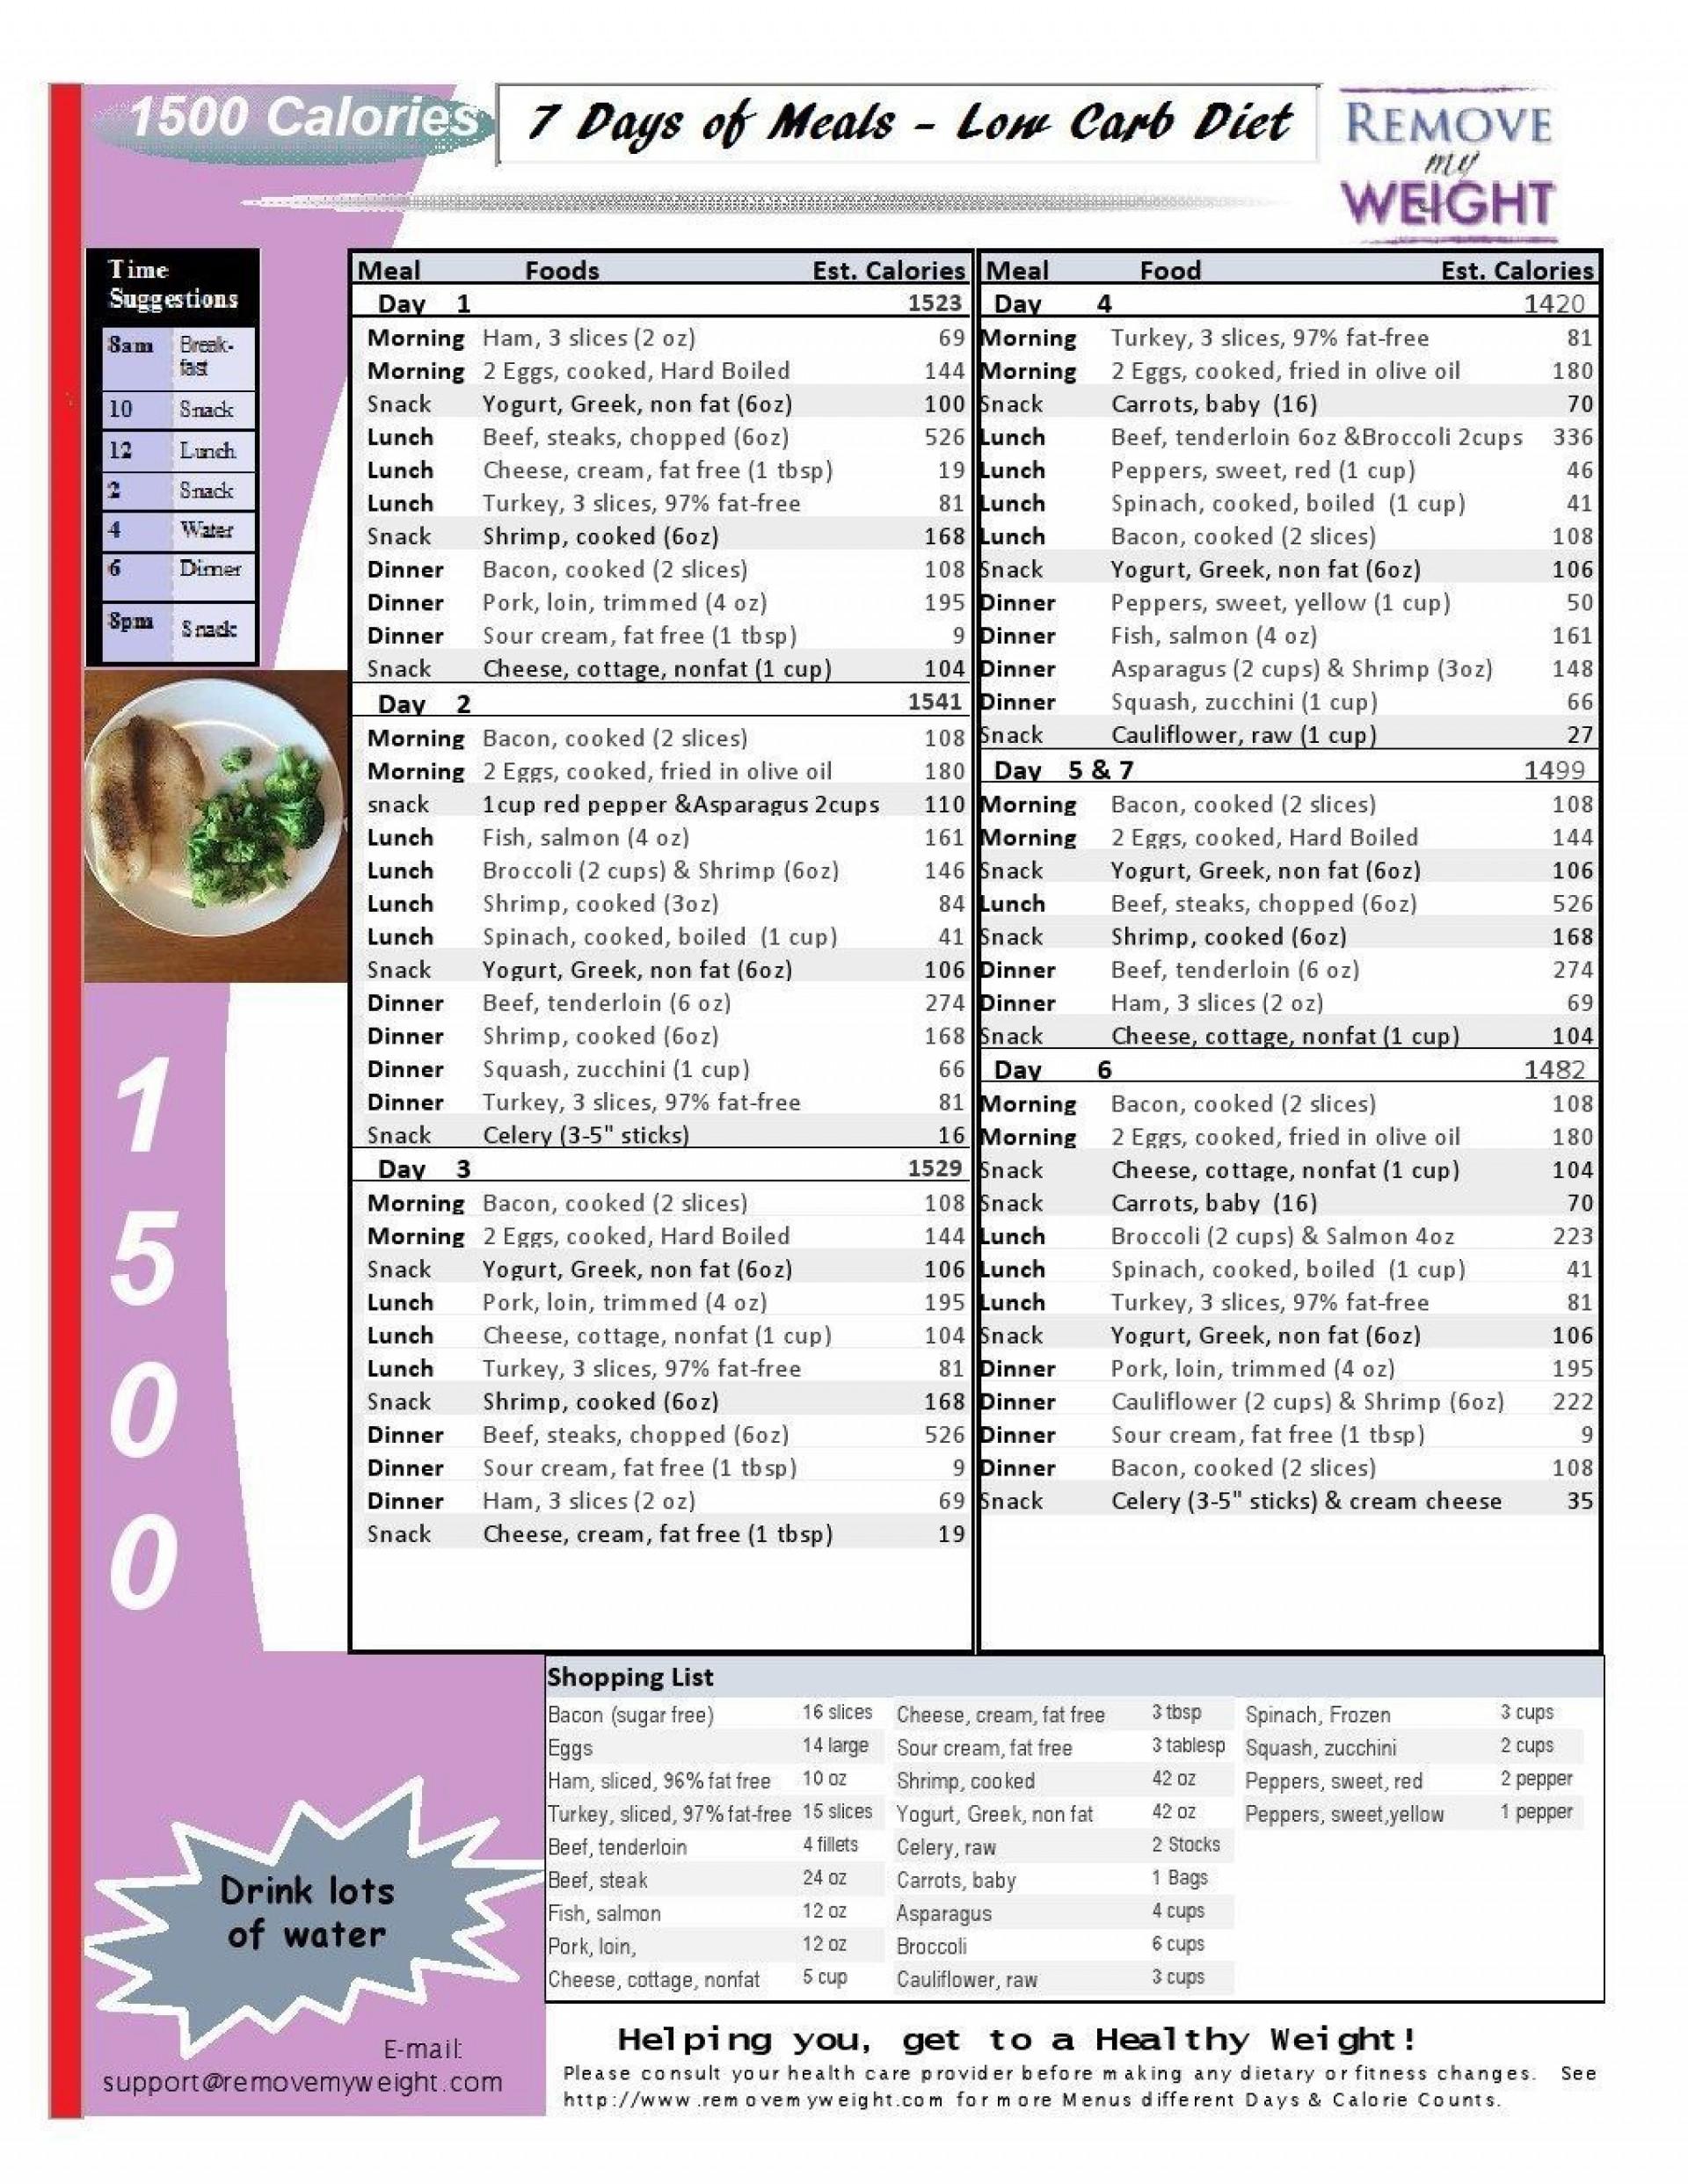 008 Excellent 1400 Calorie Sample Meal Plan Pdf High Def 1920